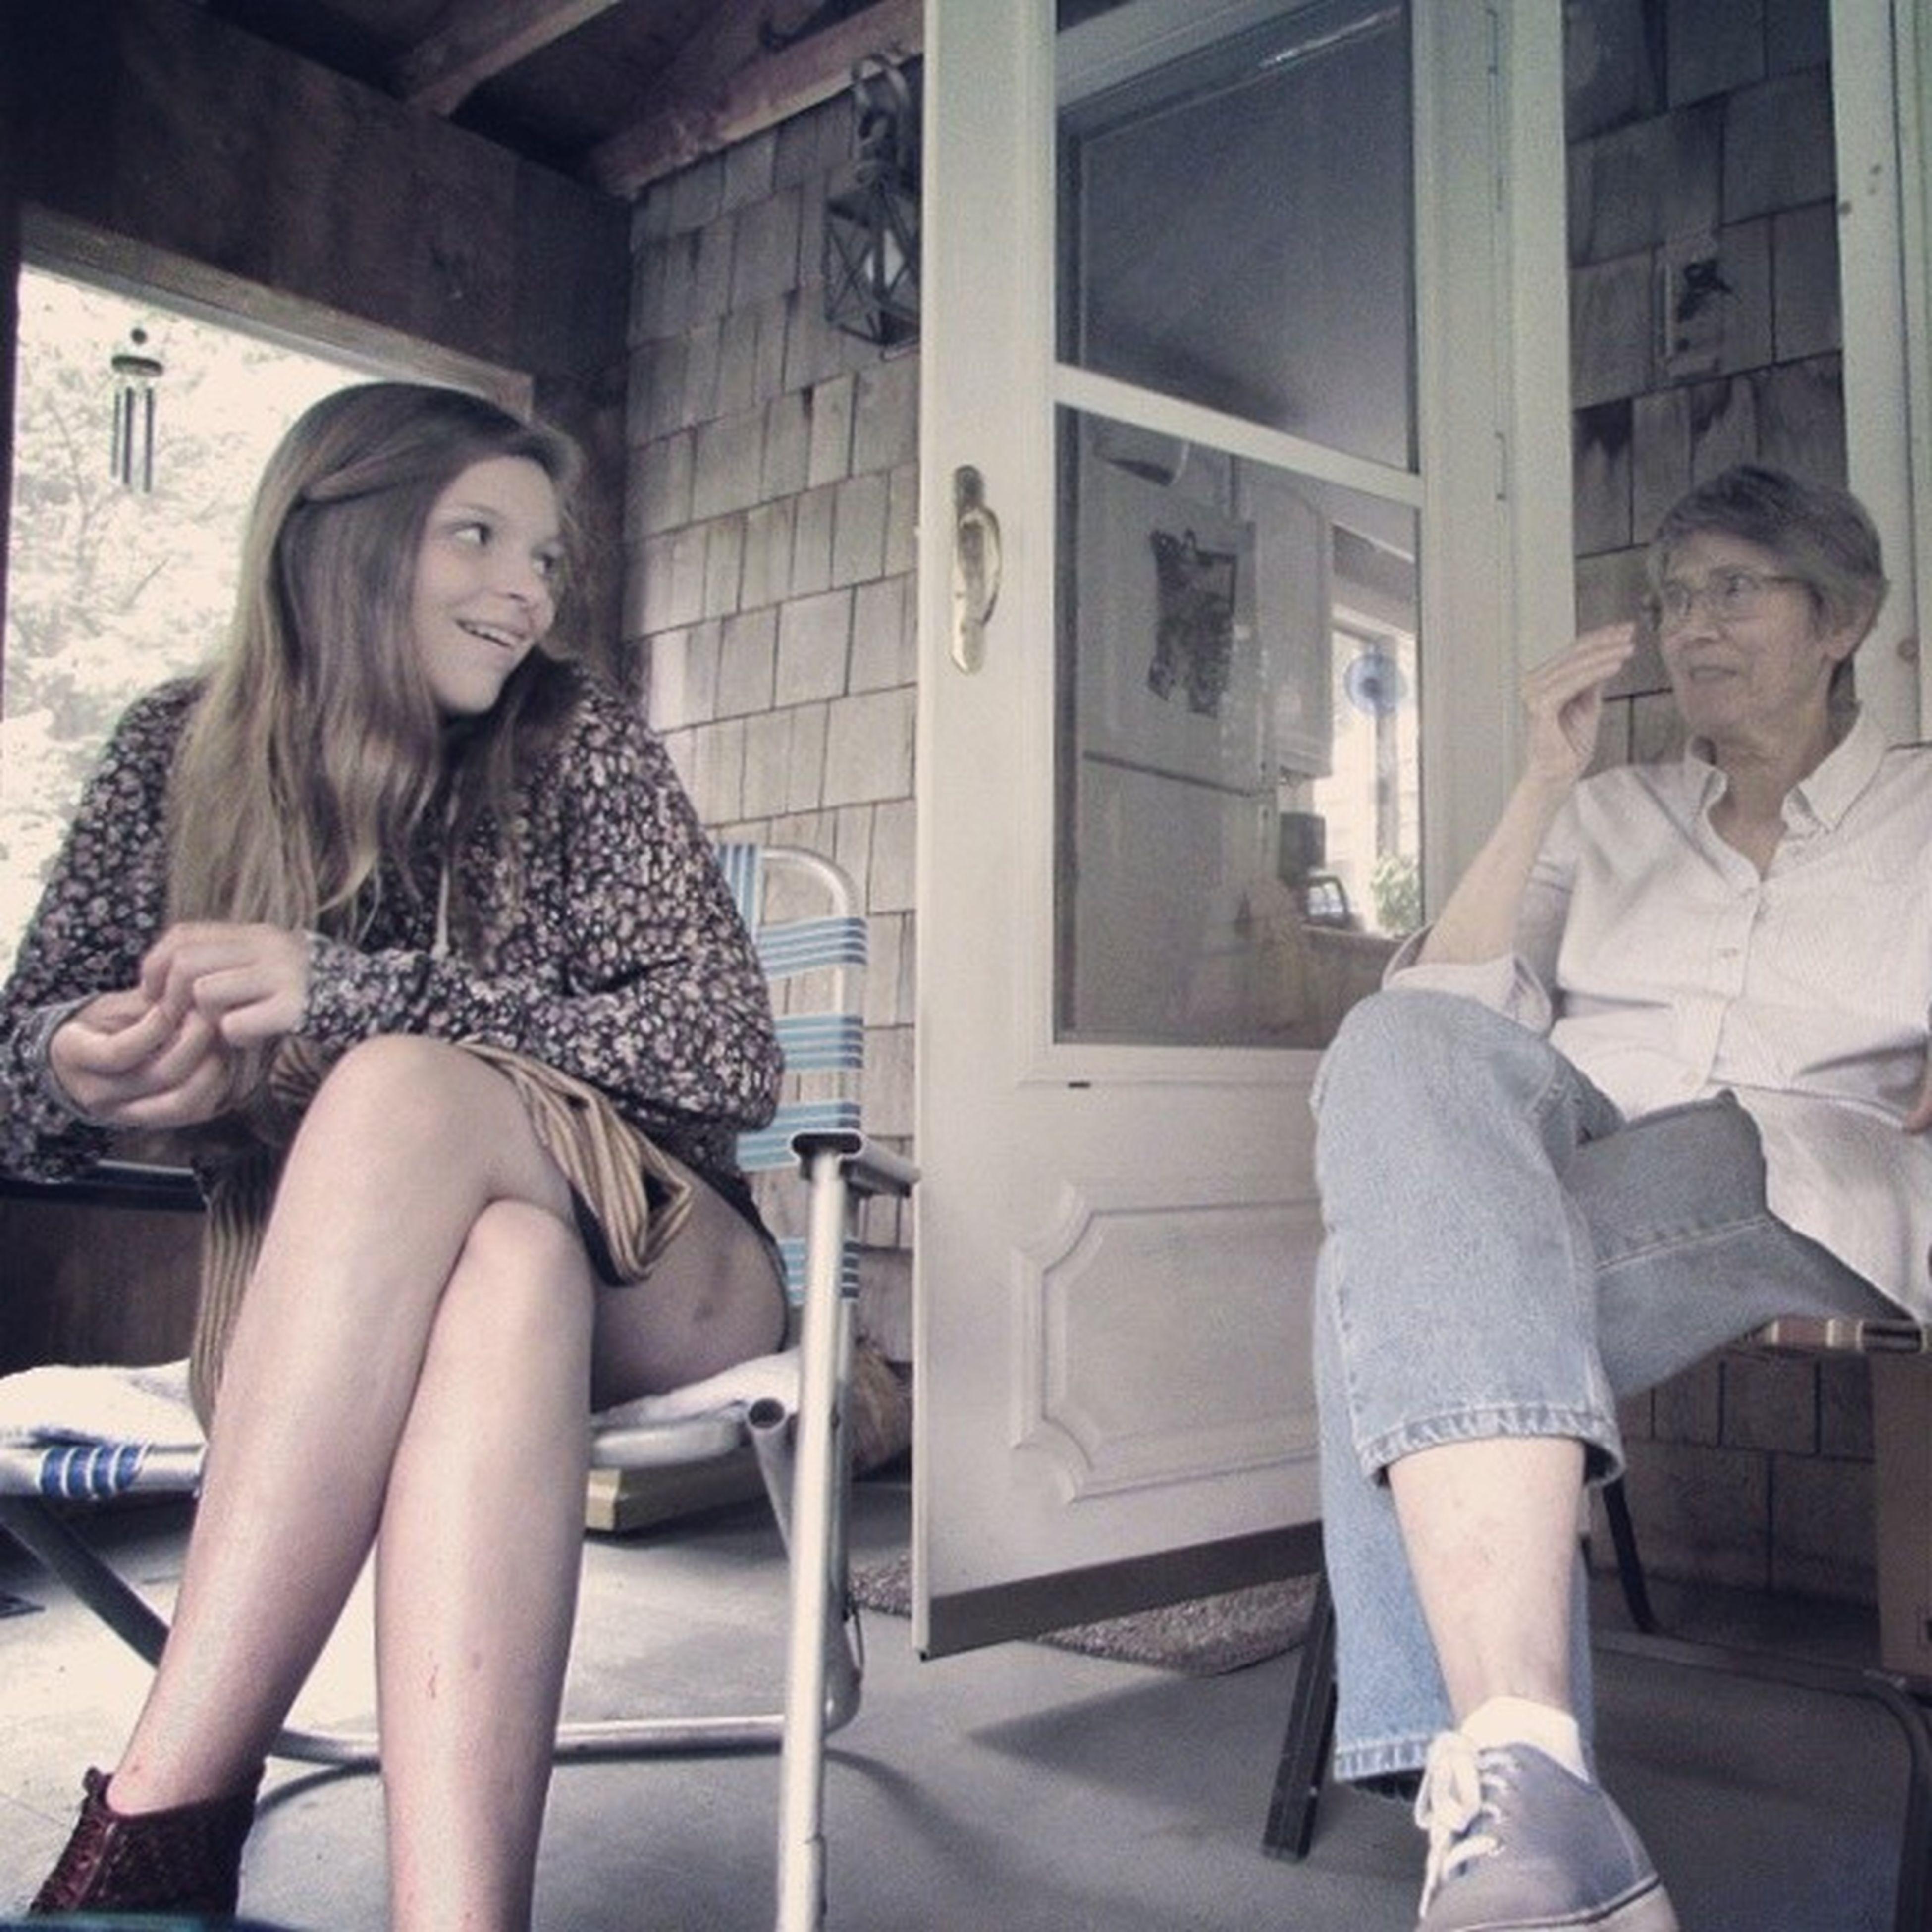 Oldfasioned Talk OnThePorch Nocellphones just actualcameras reallife storytelling